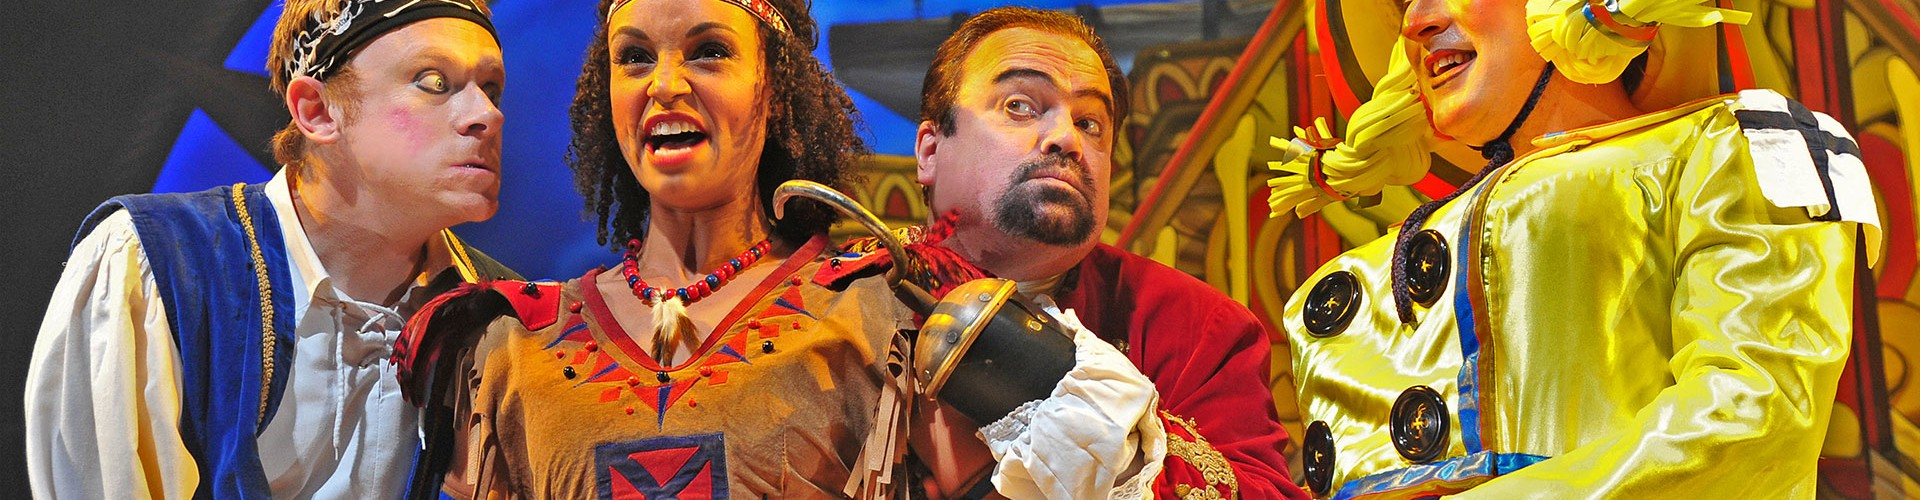 Marlowe_Theatre_Peter_Pan_Review